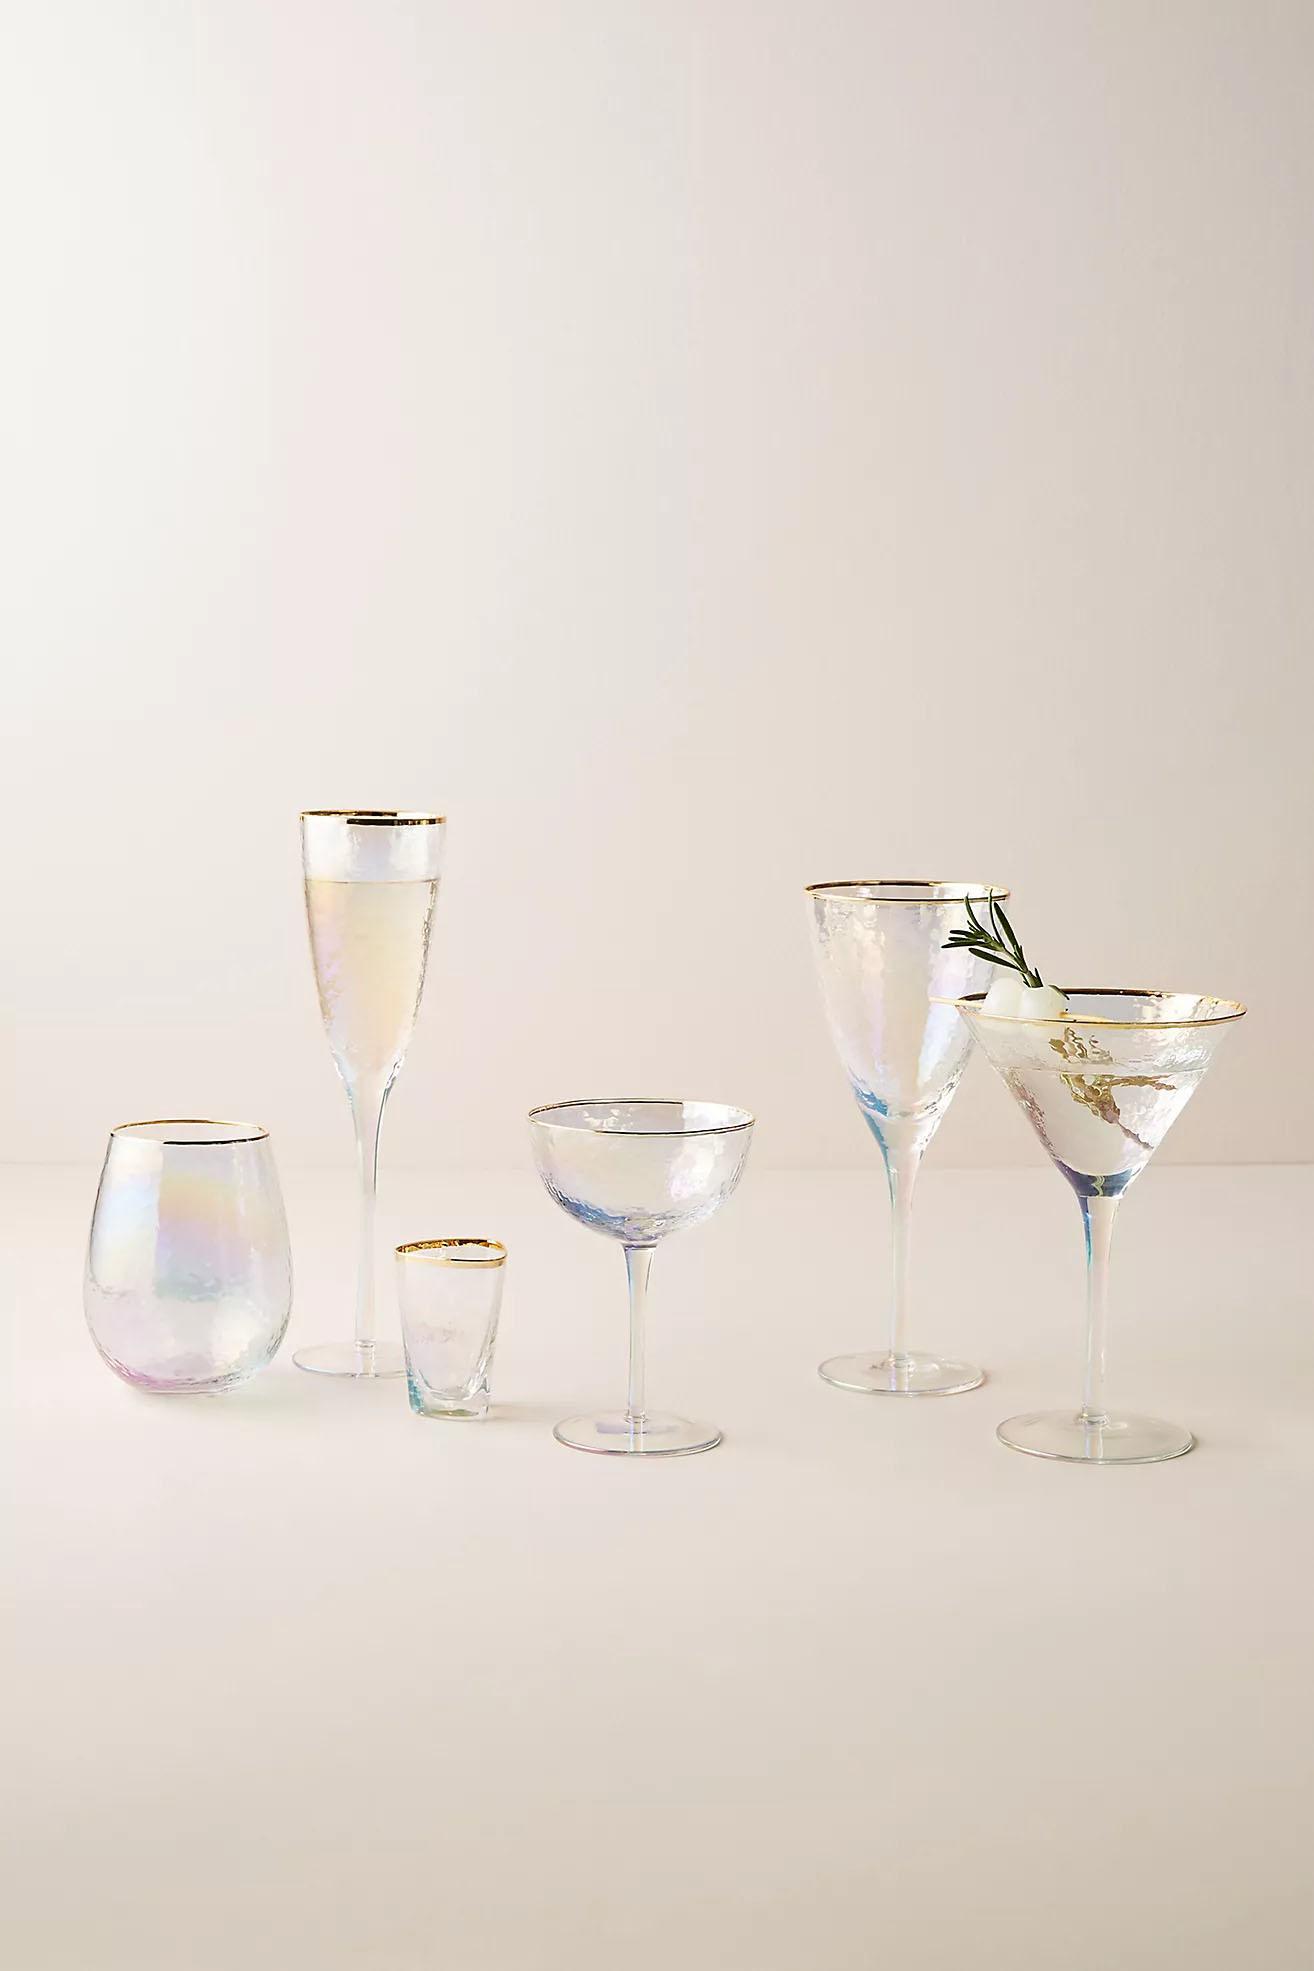 keepsake golf rimmed bridesmaid wine glasses bridal party gift idea